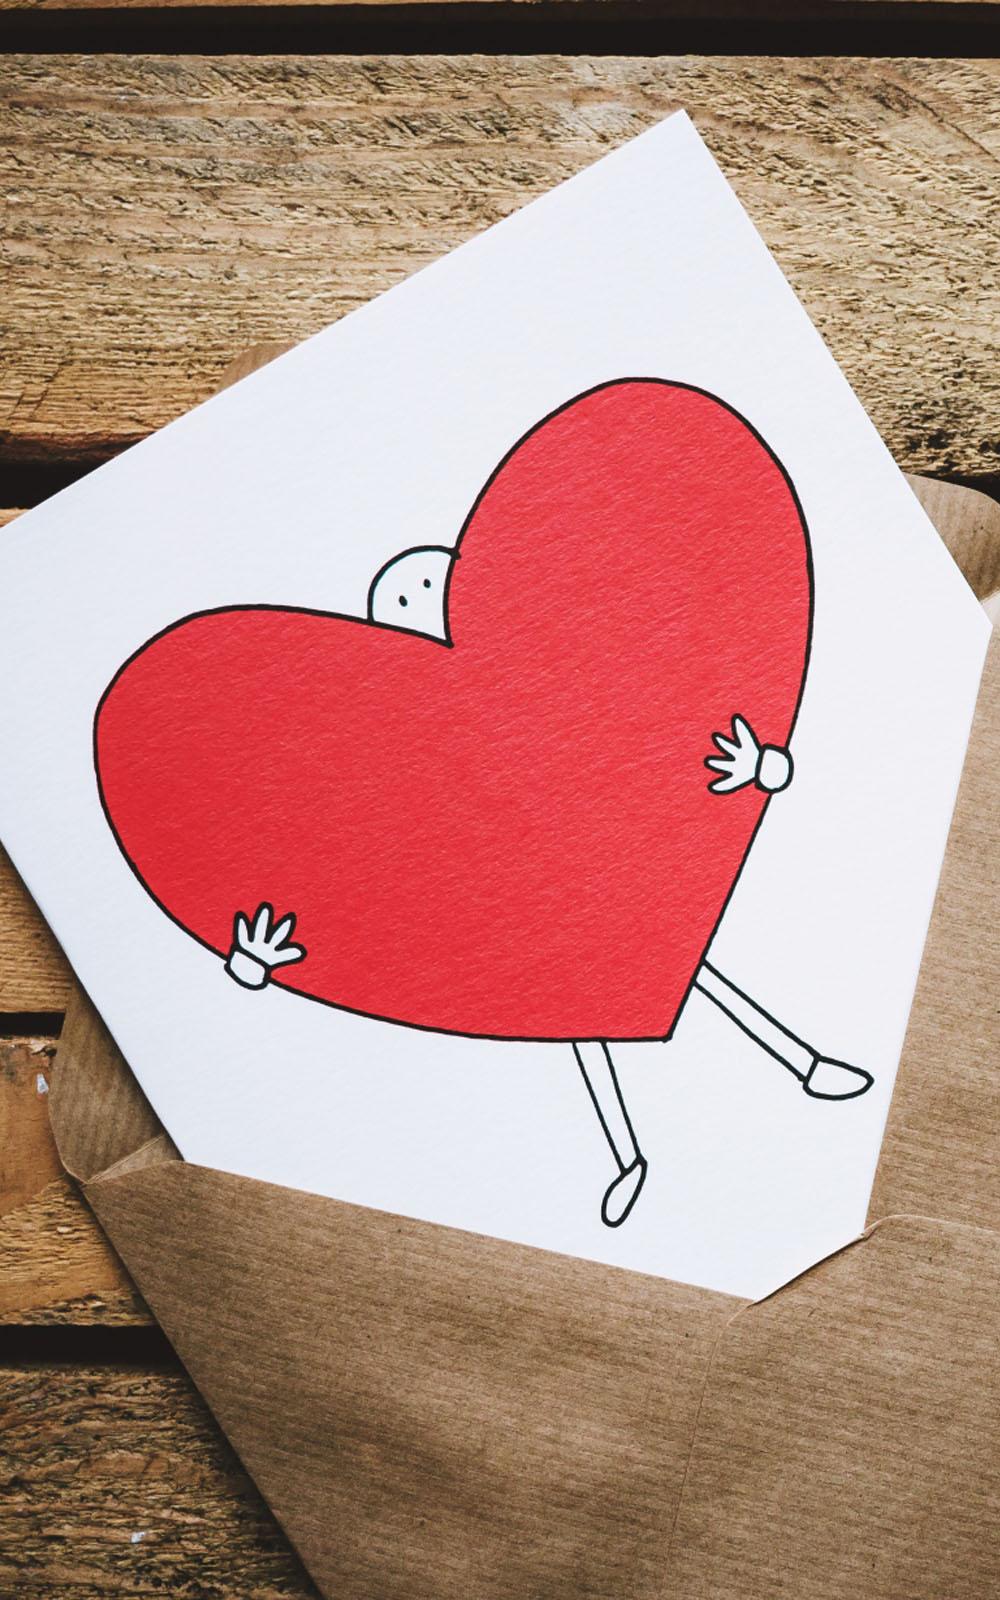 Love Heart Postcard Envelope Free 4k Ultra Hd Mobile Wallpaper